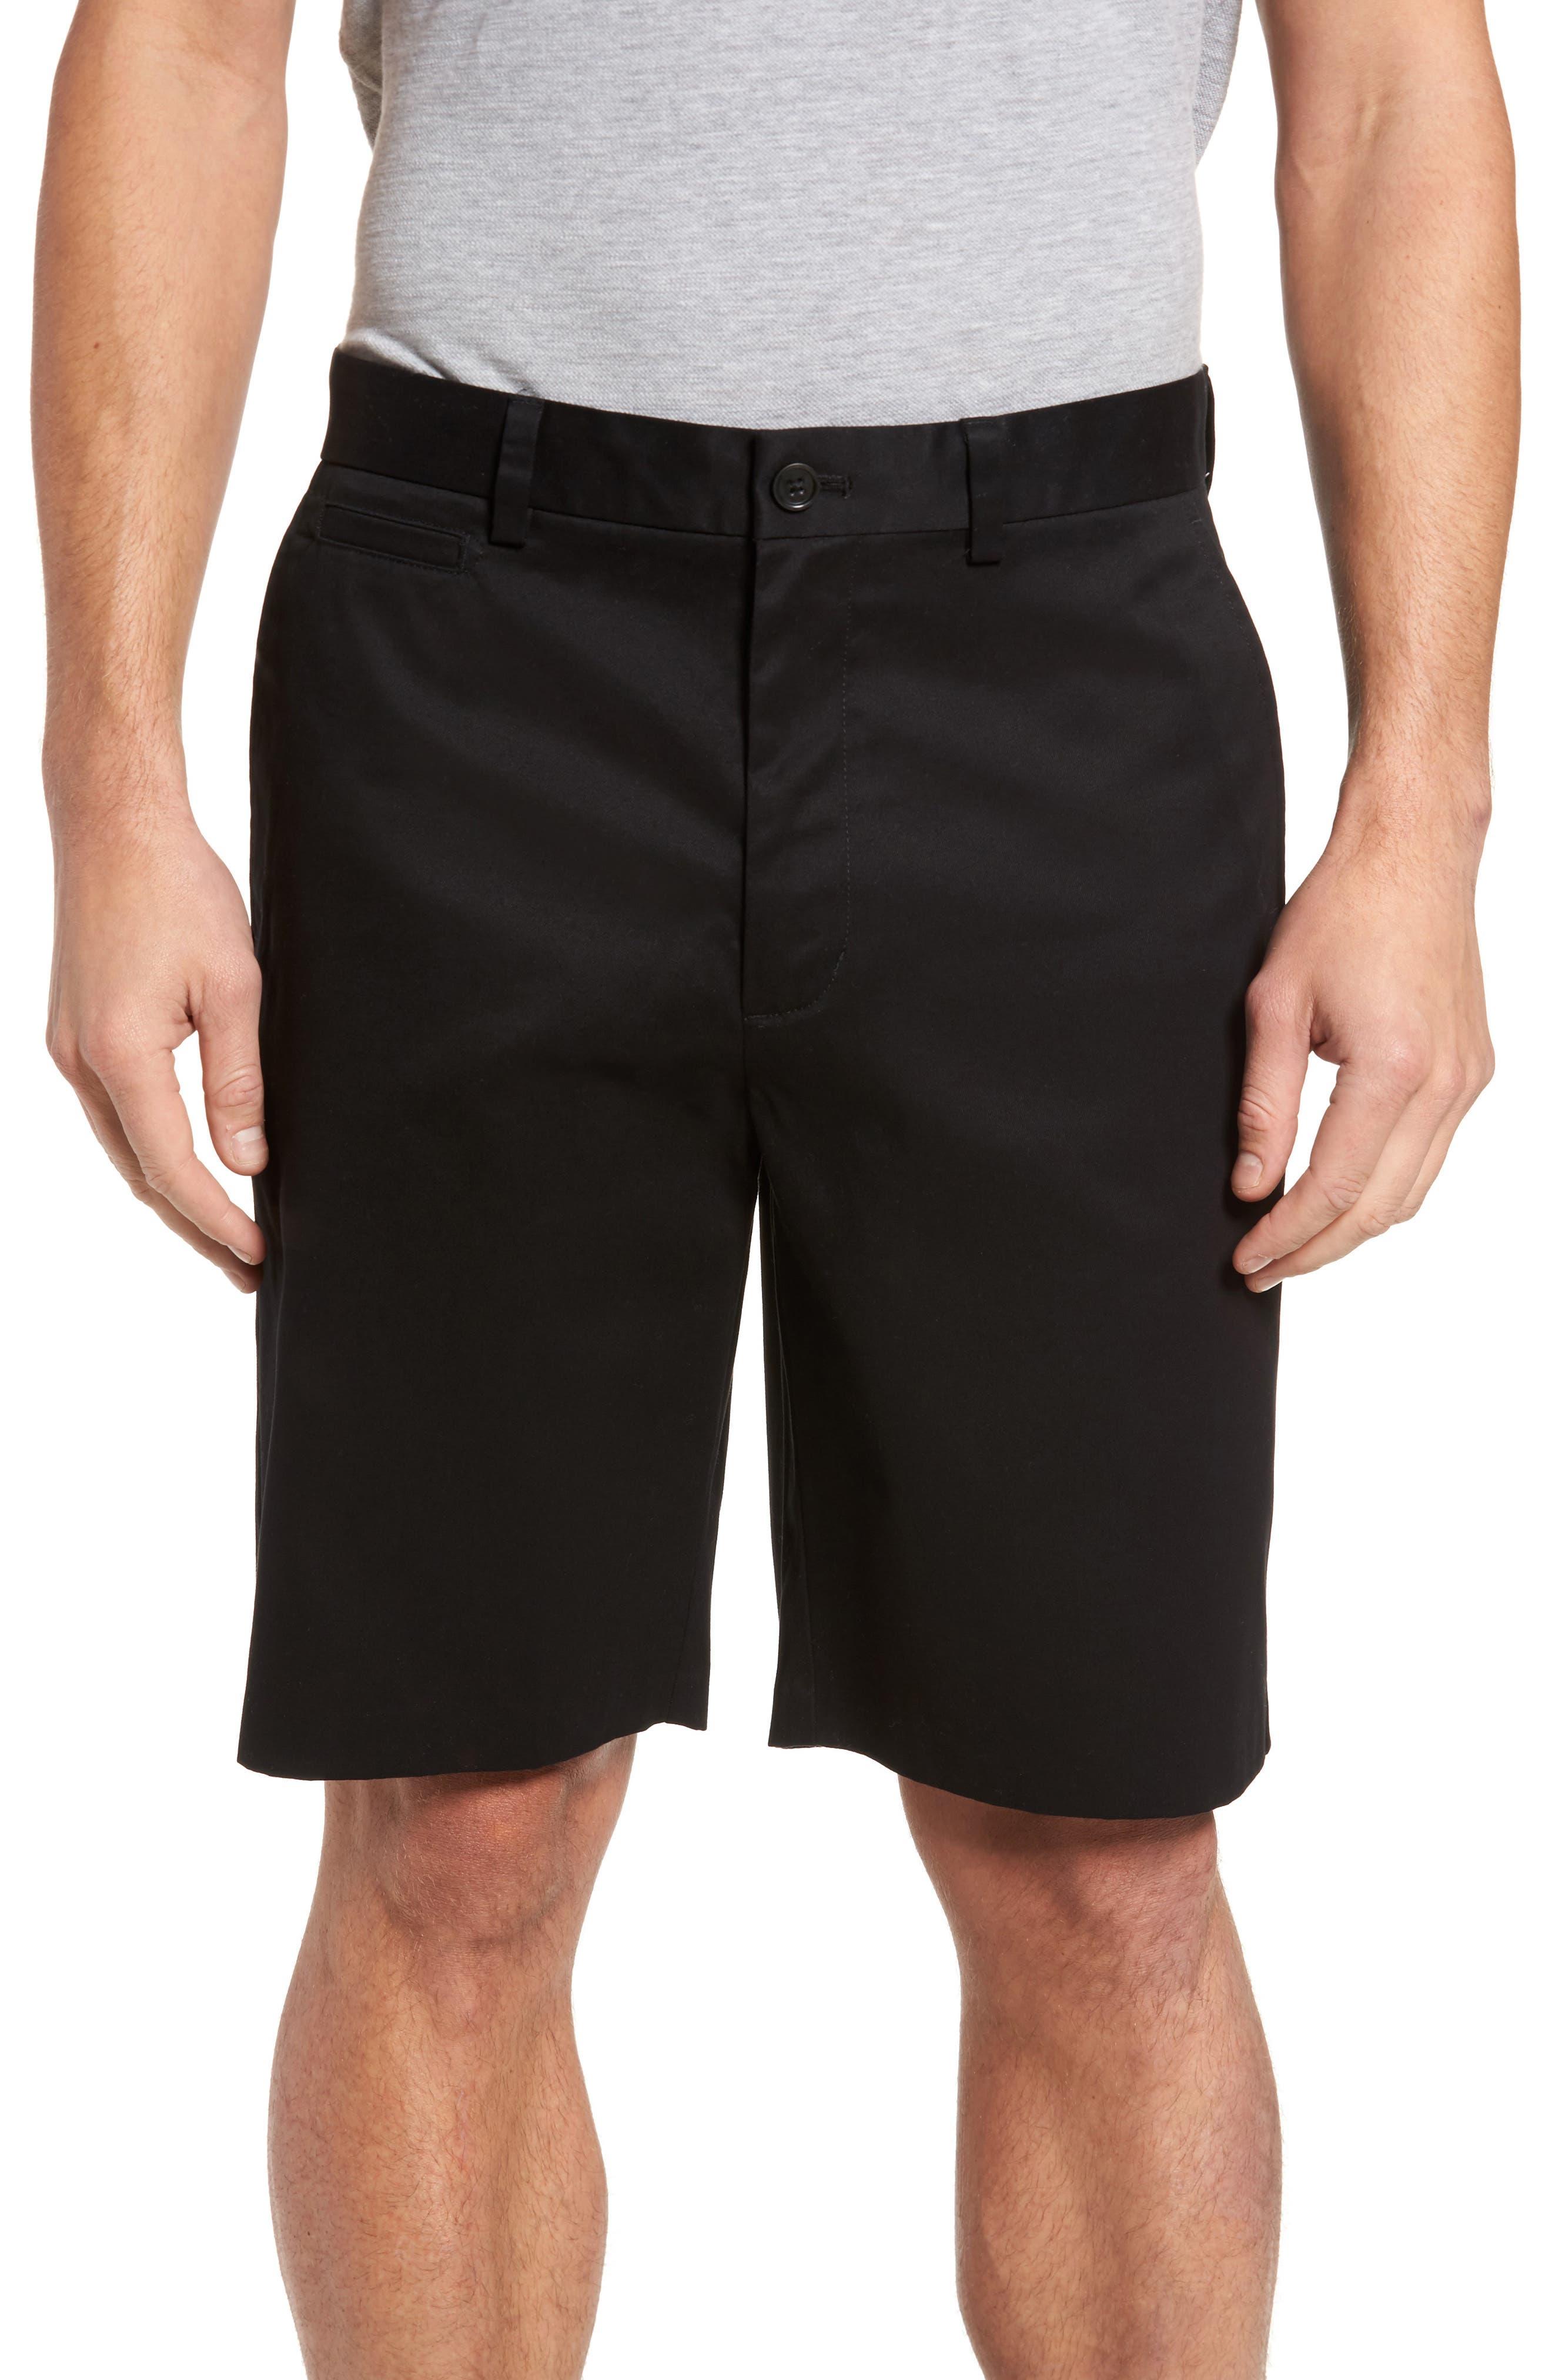 NORDSTROM MEN'S SHOP Smartcare<sup>™</sup> Flat Front Shorts, Main, color, BLACK